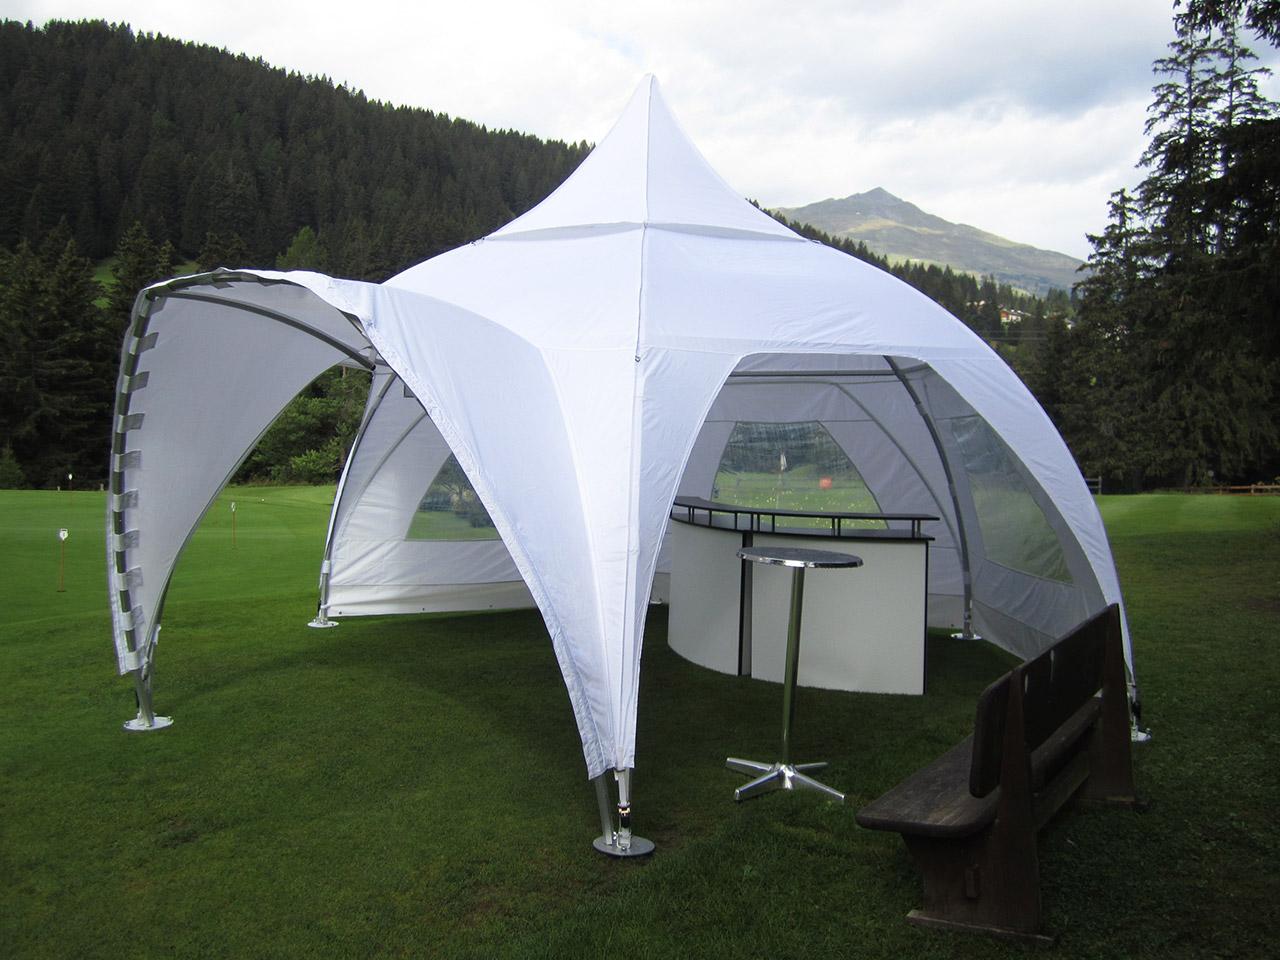 Festmobiliar Rundzelt Dome